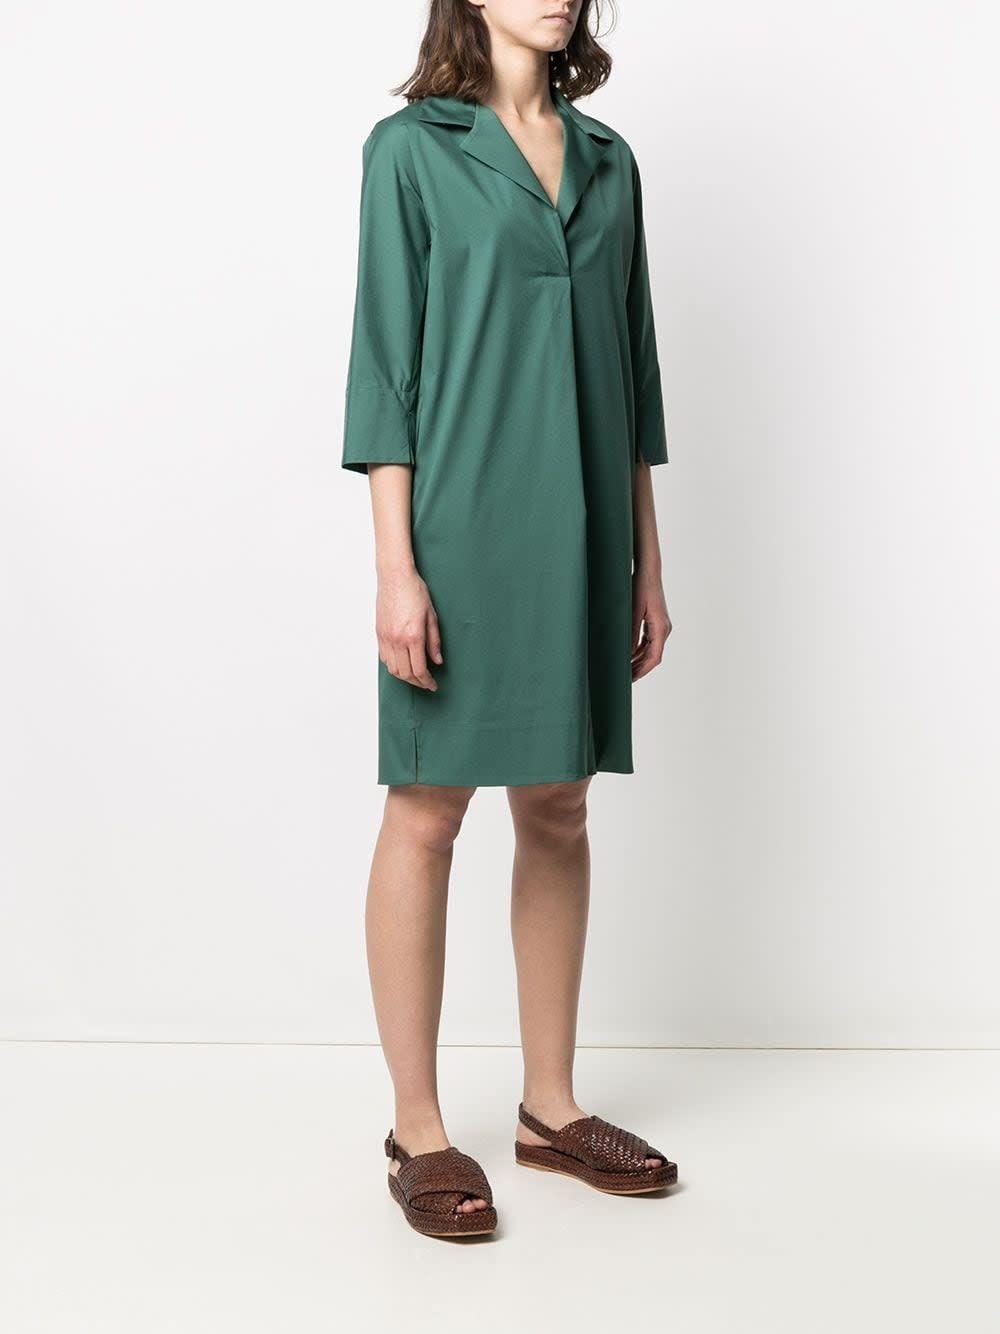 Melania dress antonelli-3